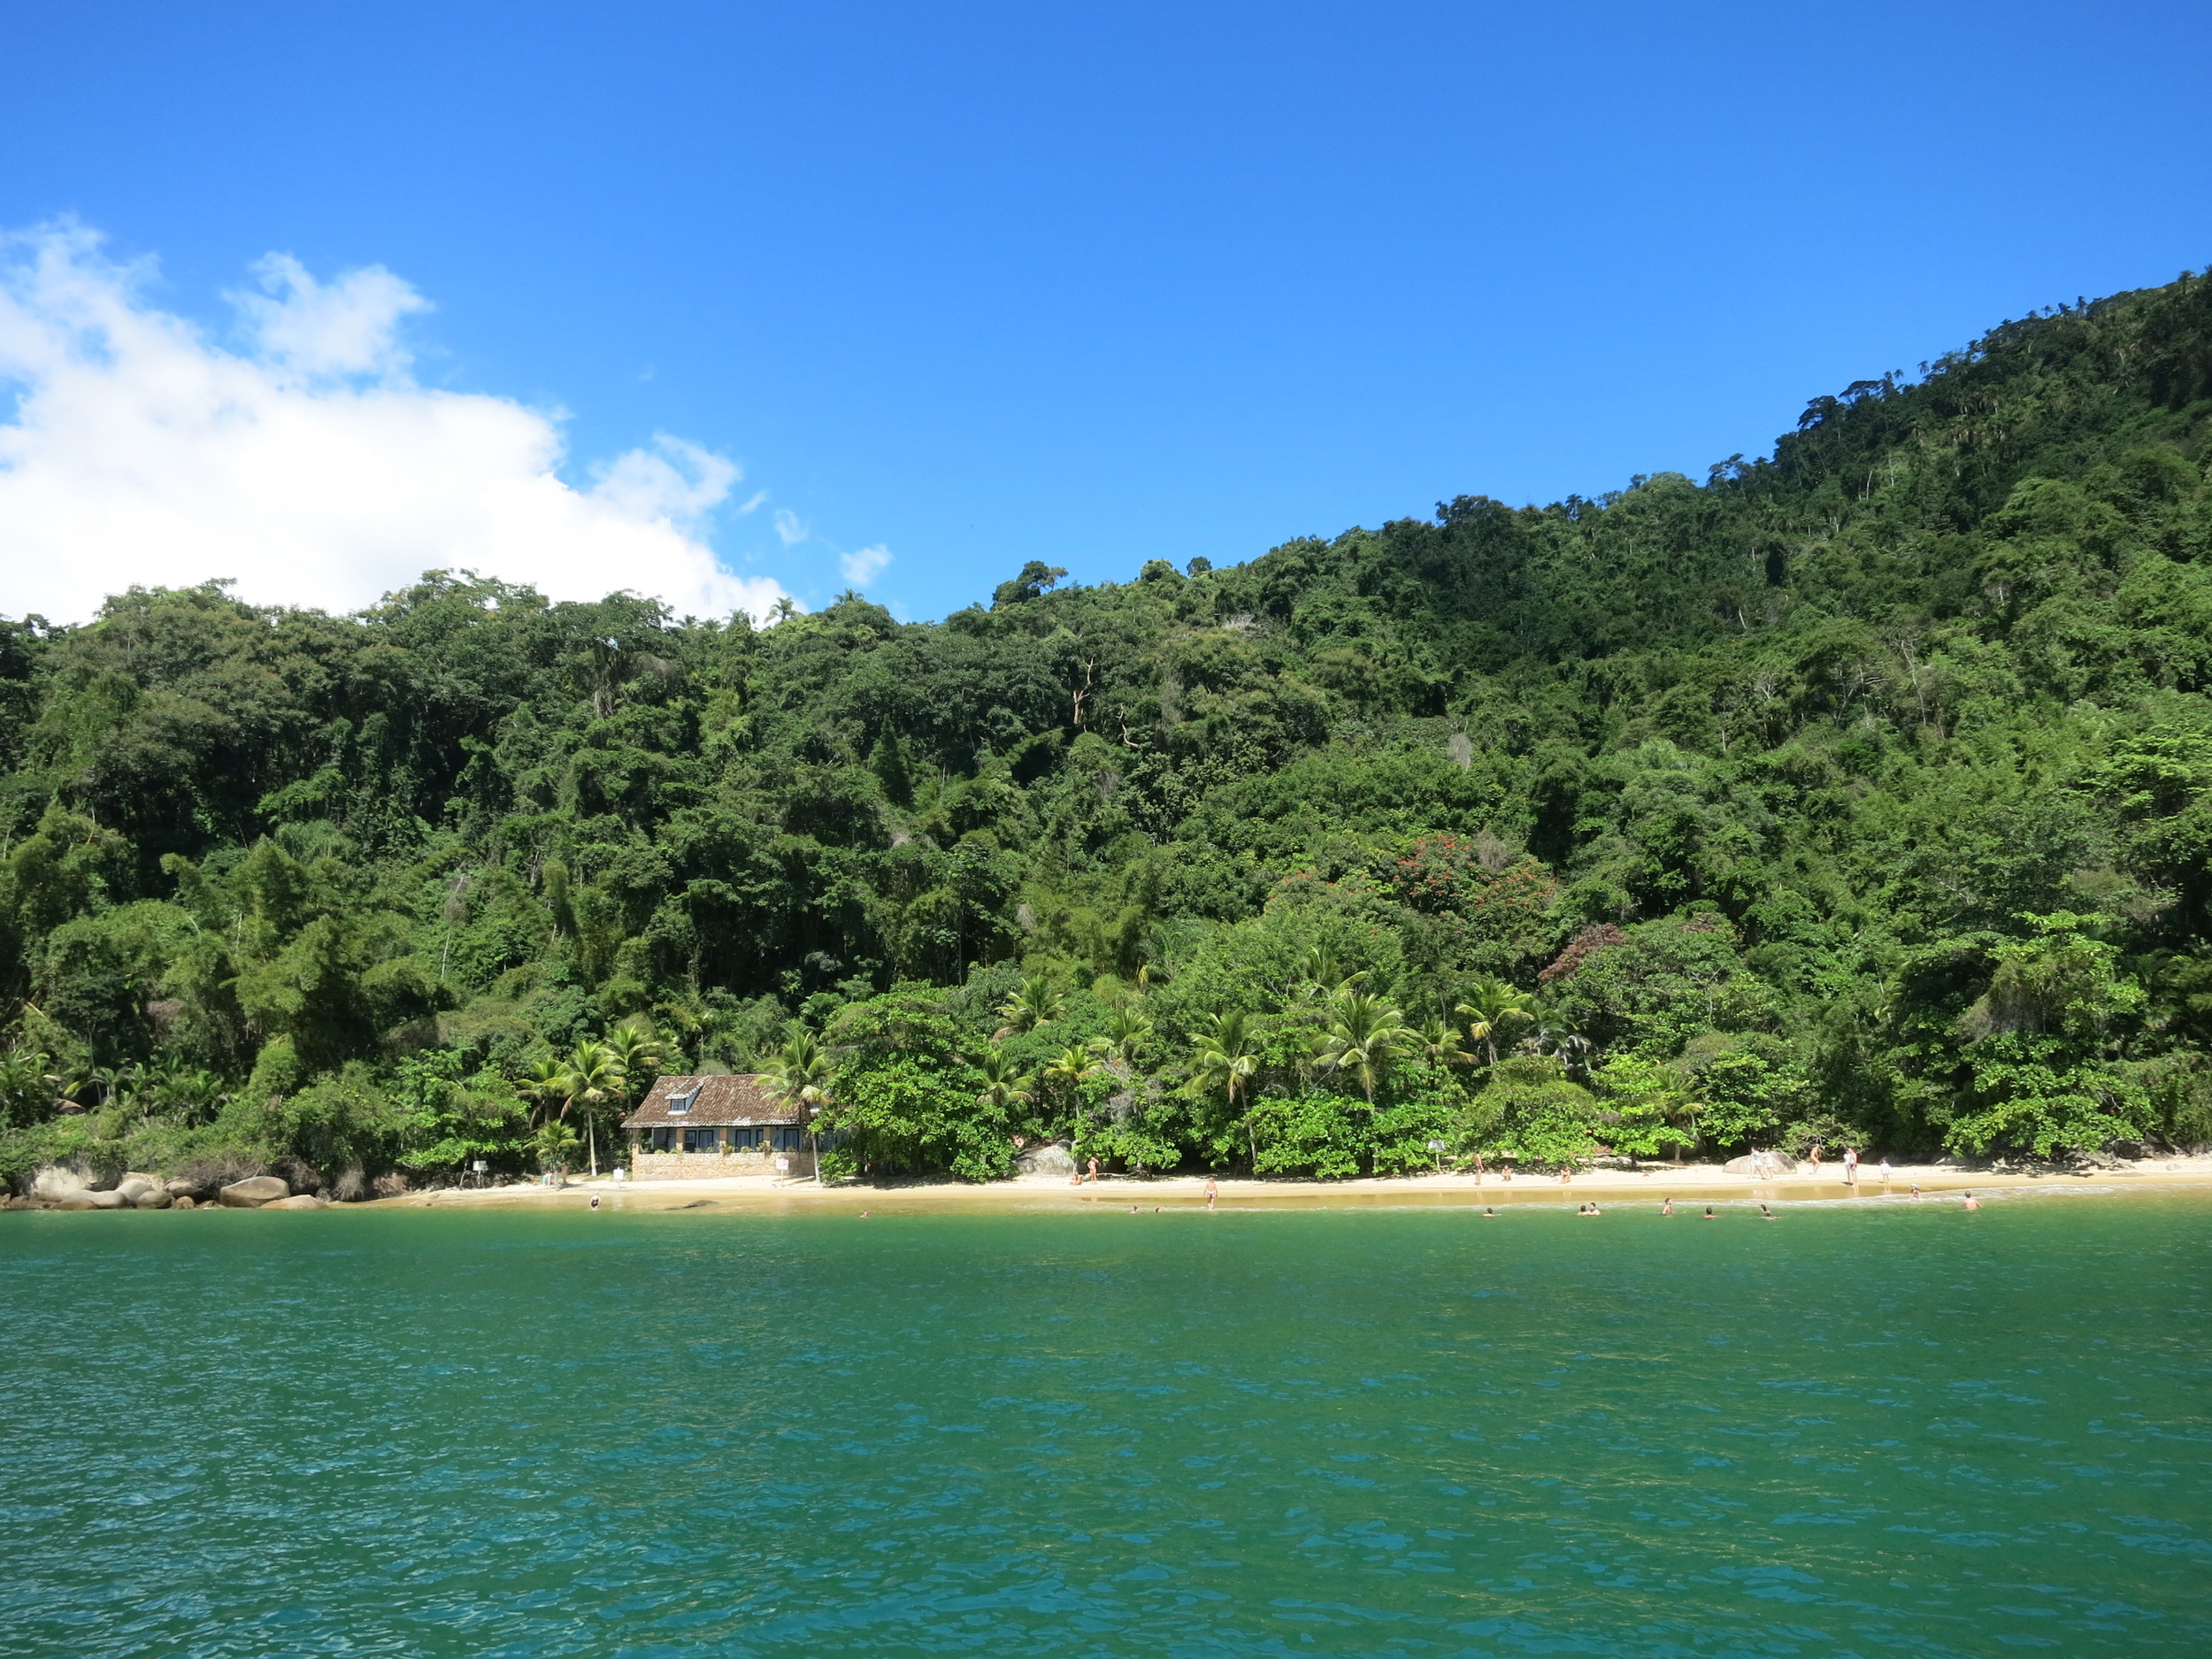 Our first beach - Lula